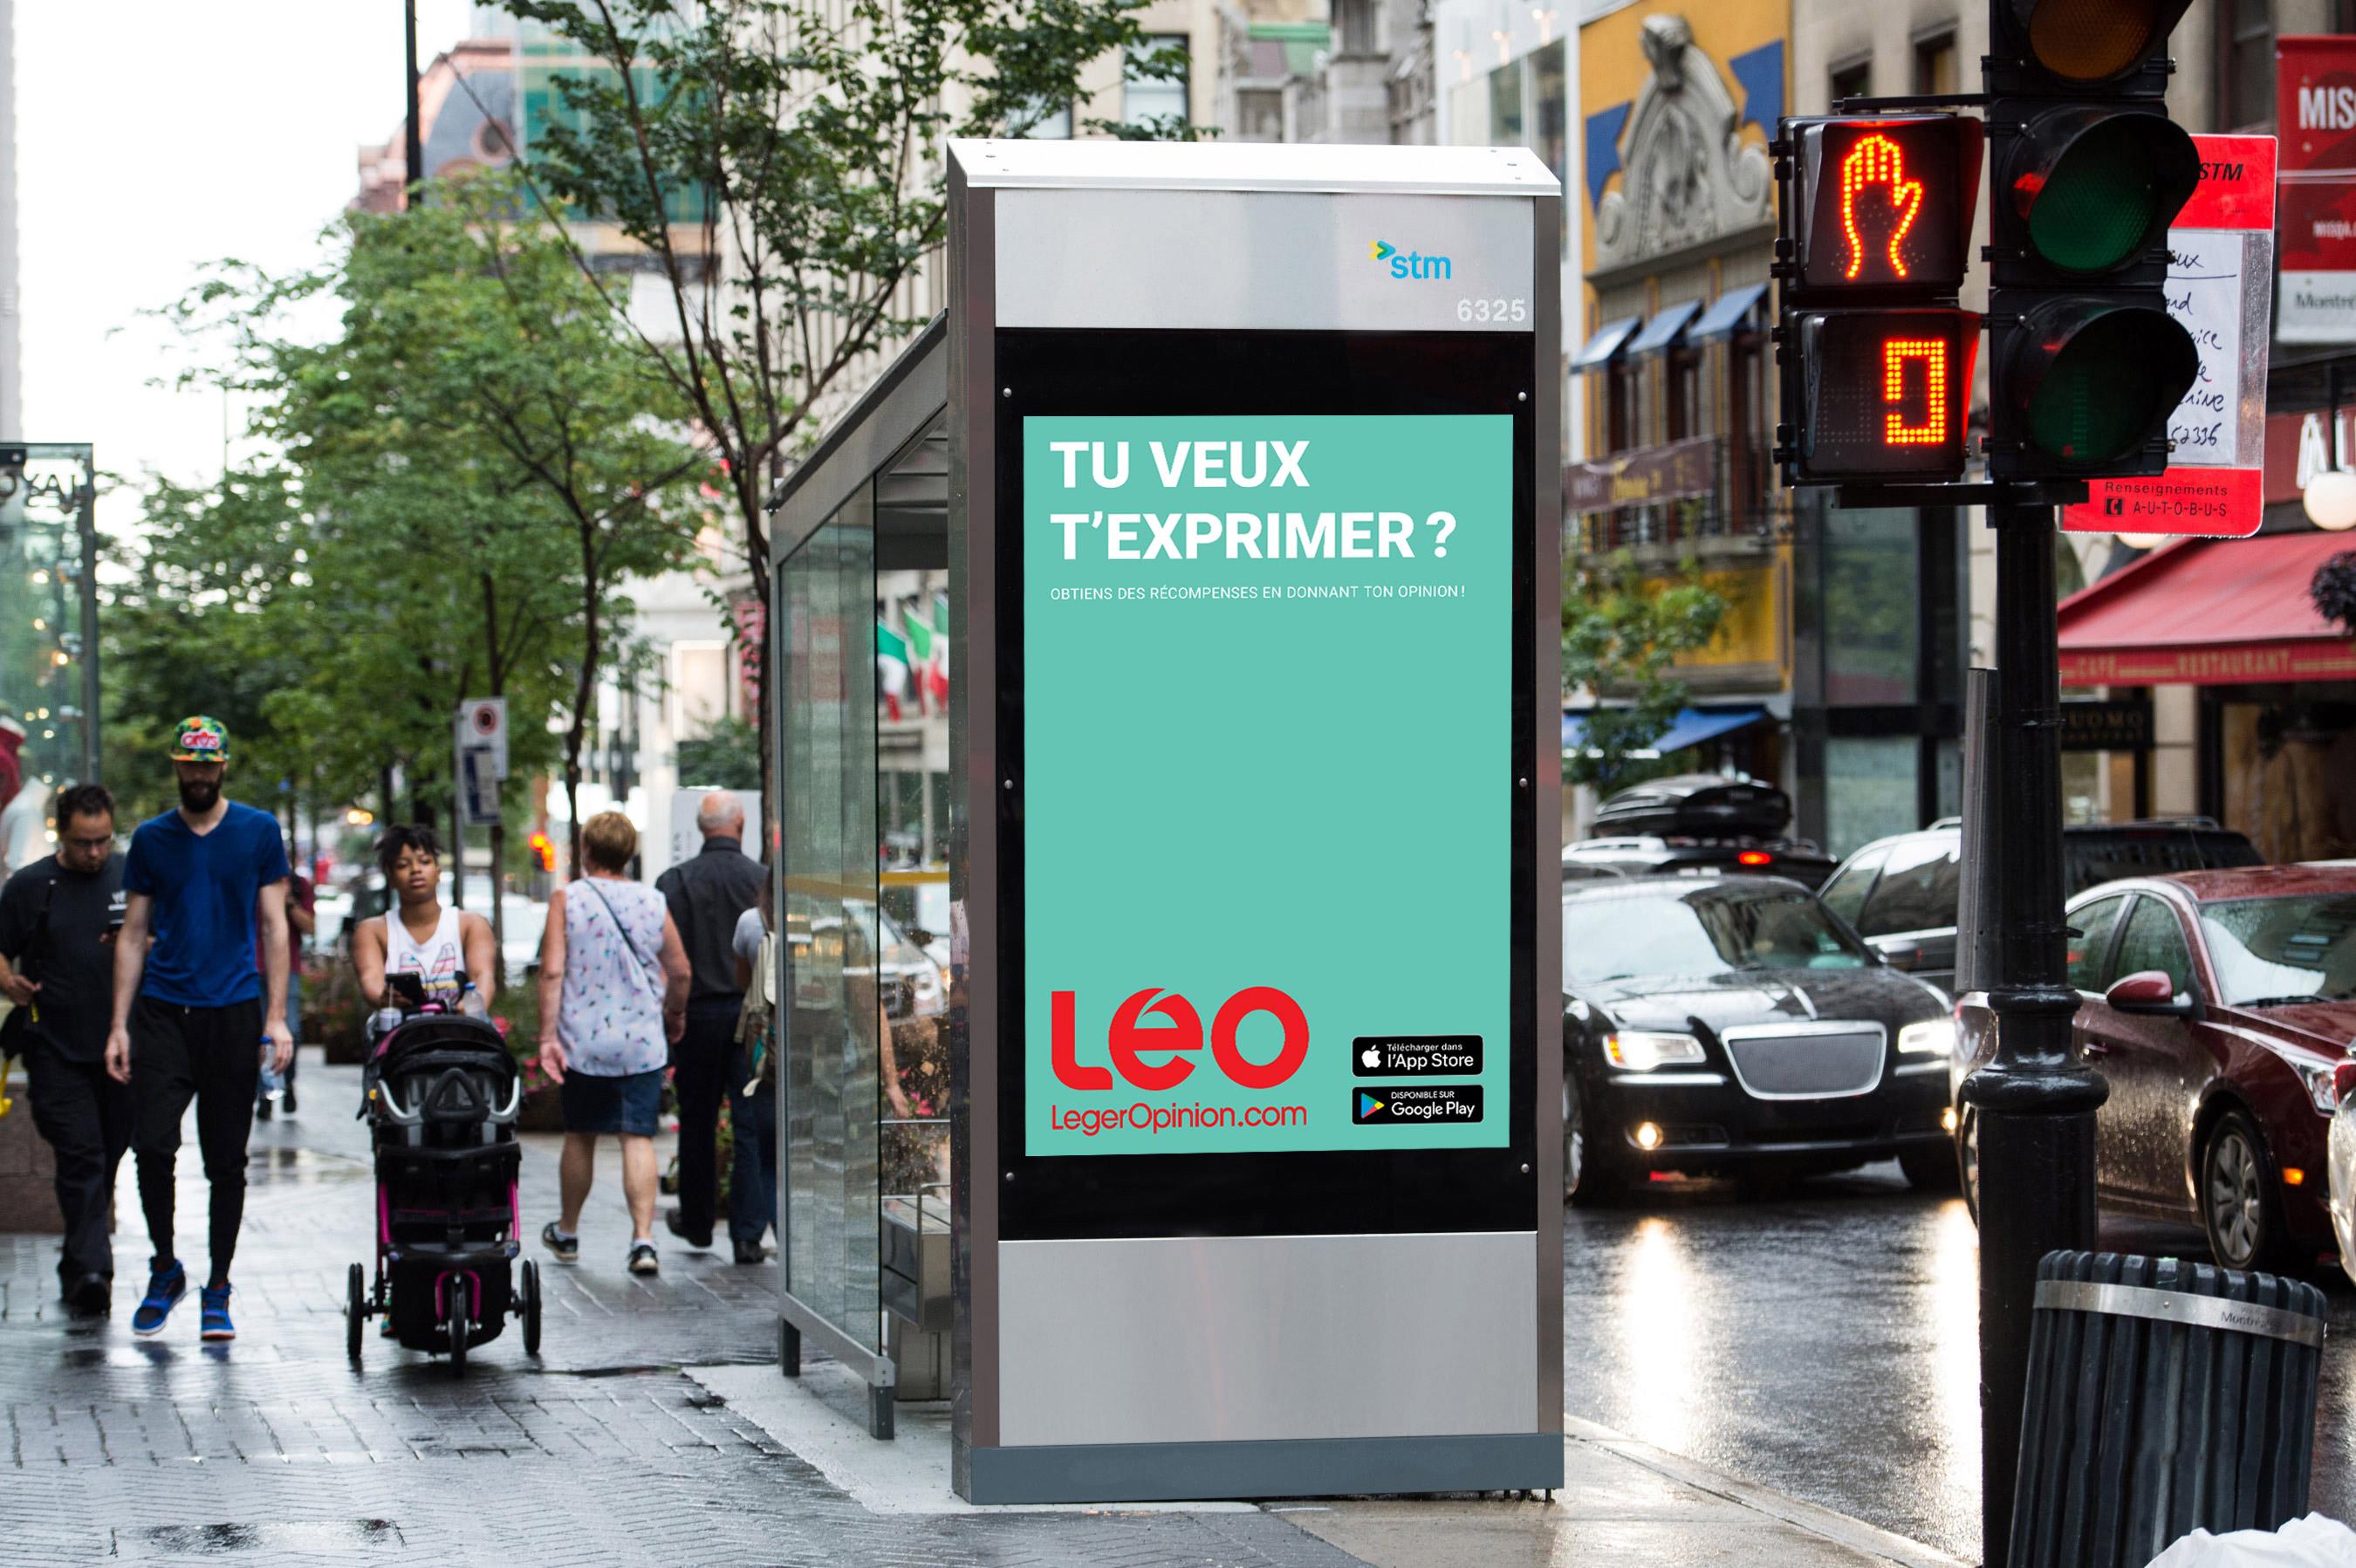 LEO - Léger 1